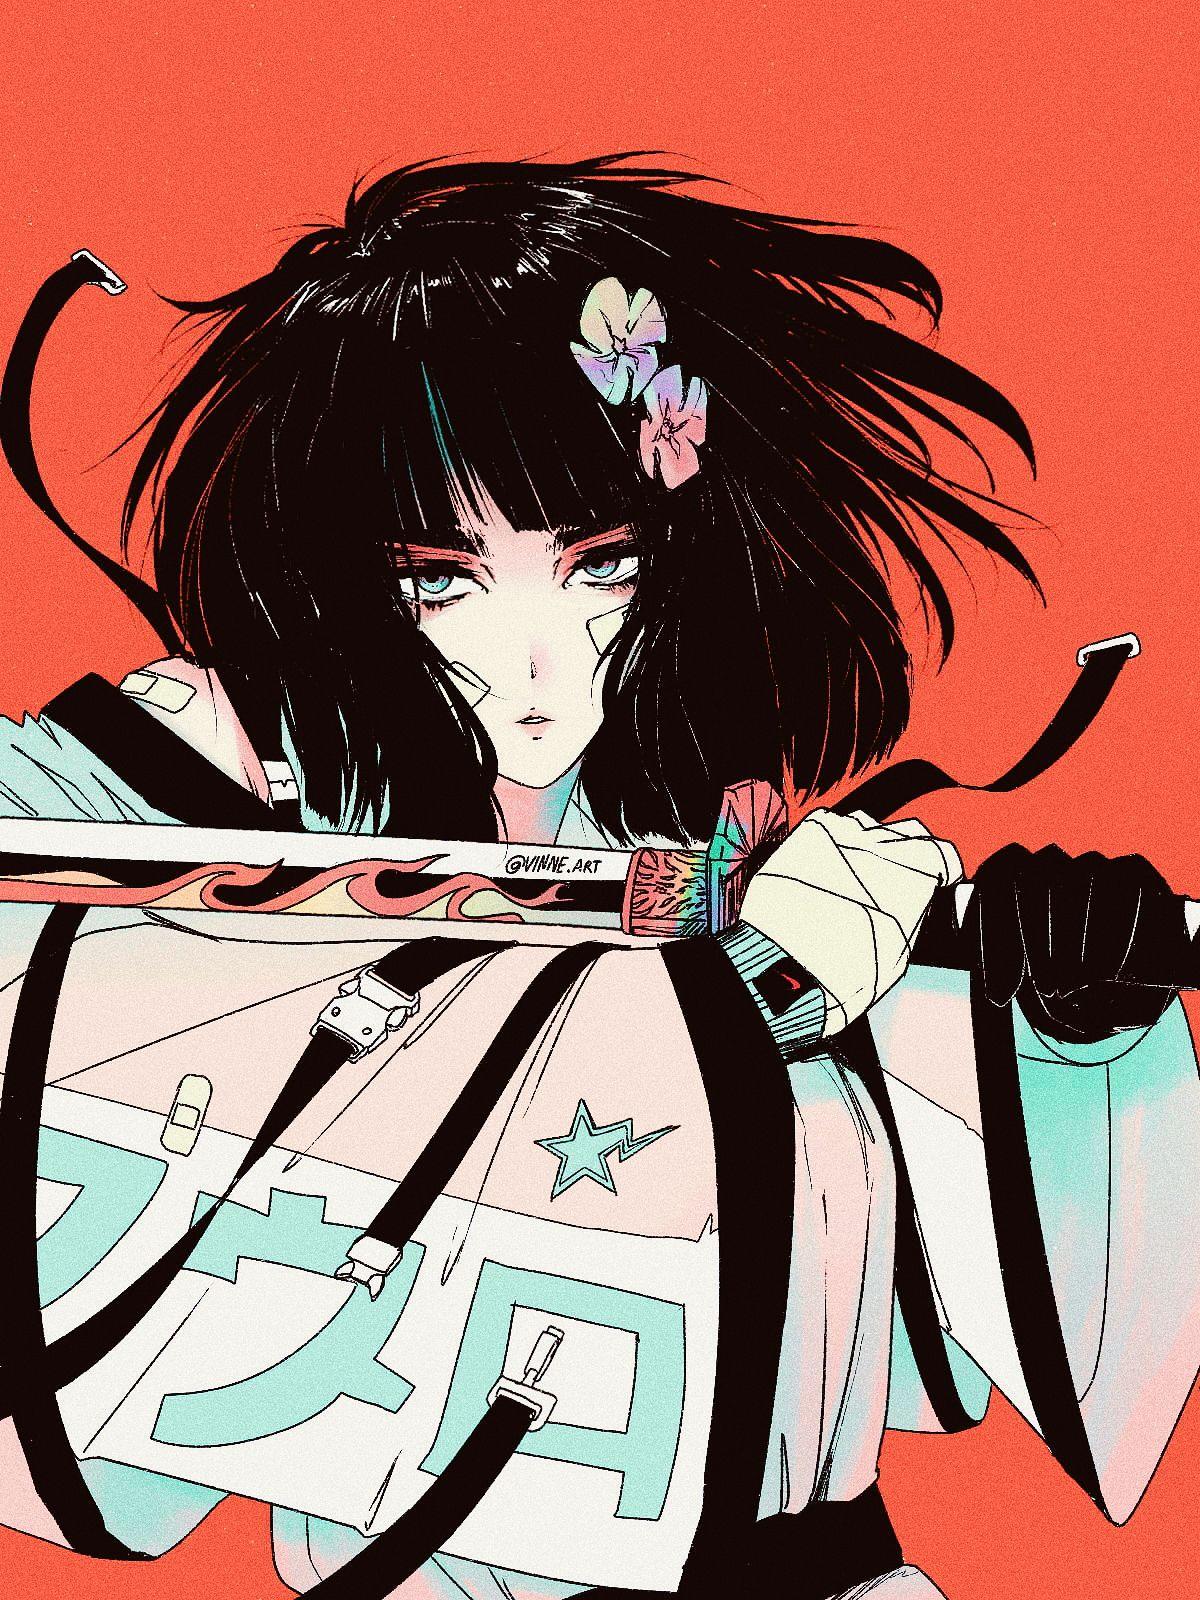 Pin By Ana Skye On Art Cute Art Samurai Art Anime Art Girl